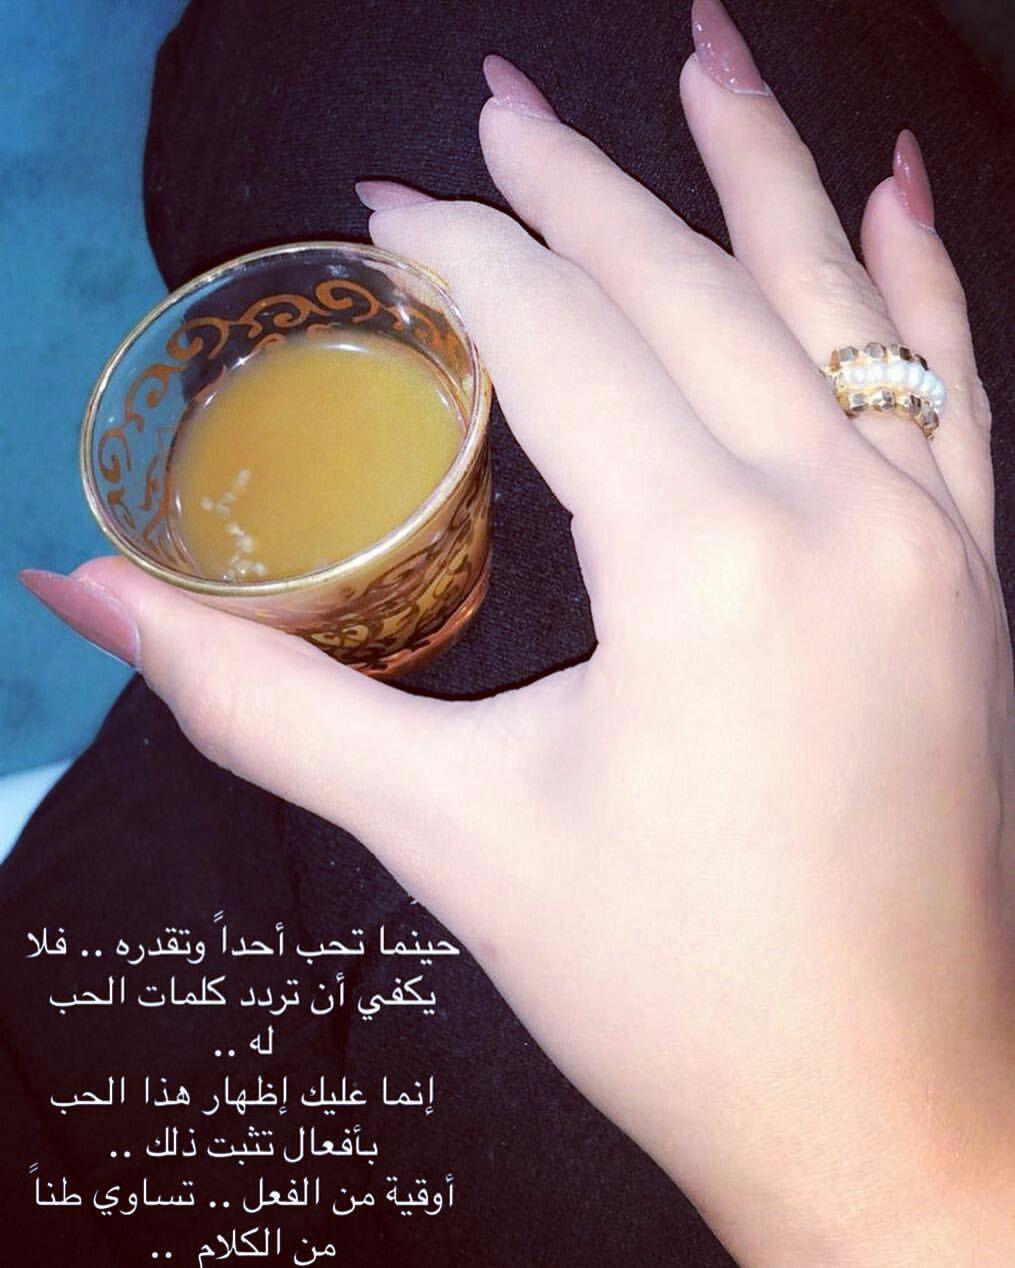 Pin By فلسطينية ولي الفخر On مما راق لي Glass Of Milk Glass Milk